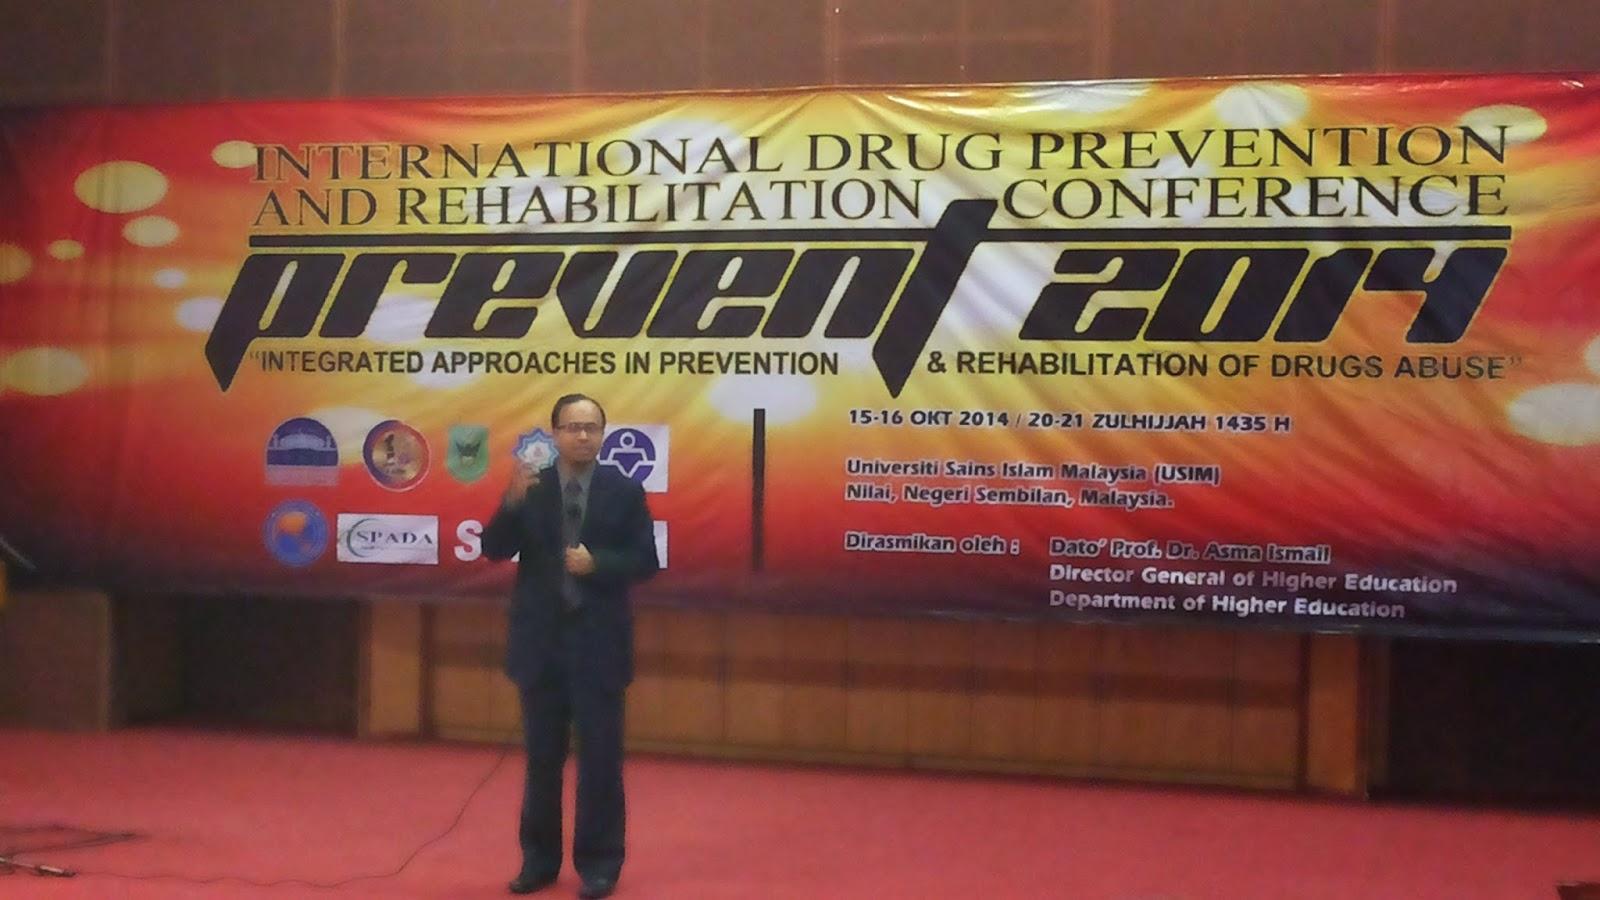 PREVENT 2014, seminar dadah, Associate Professor Dr. Mohd Rushdan b. Mohd Jailani, ACREDA